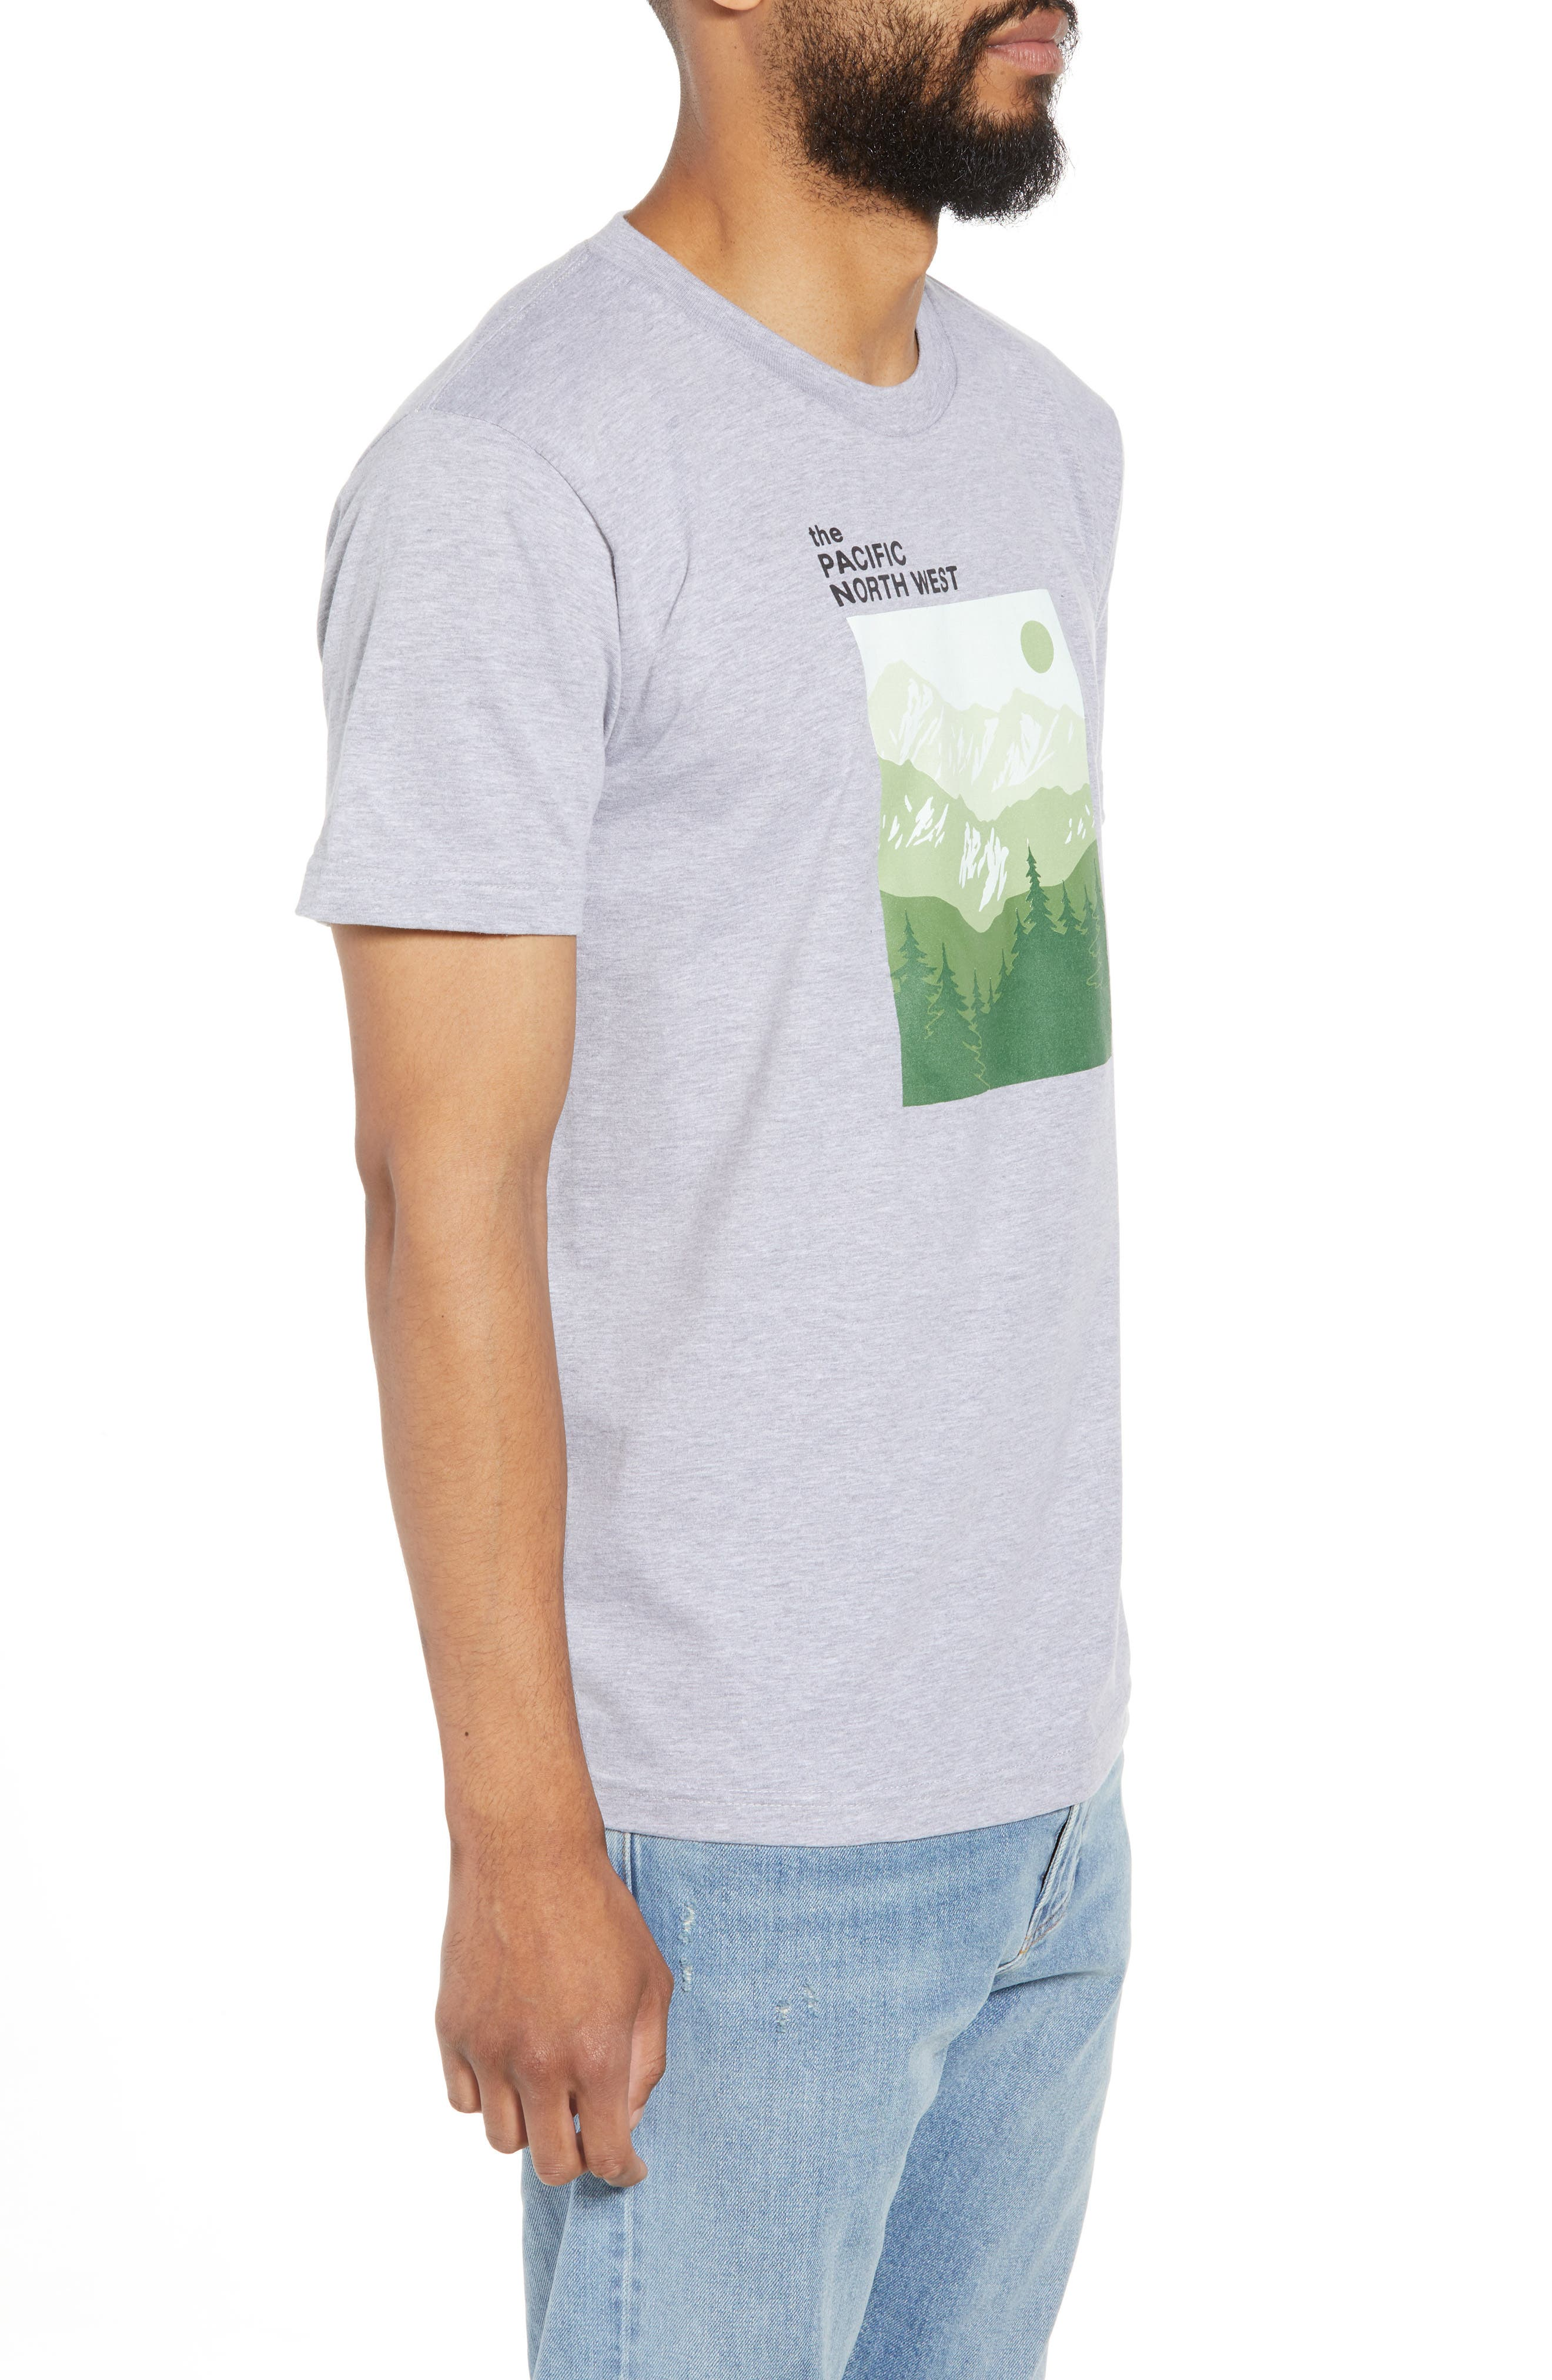 PNW Mountains Graphic T-Shirt,                             Alternate thumbnail 3, color,                             020